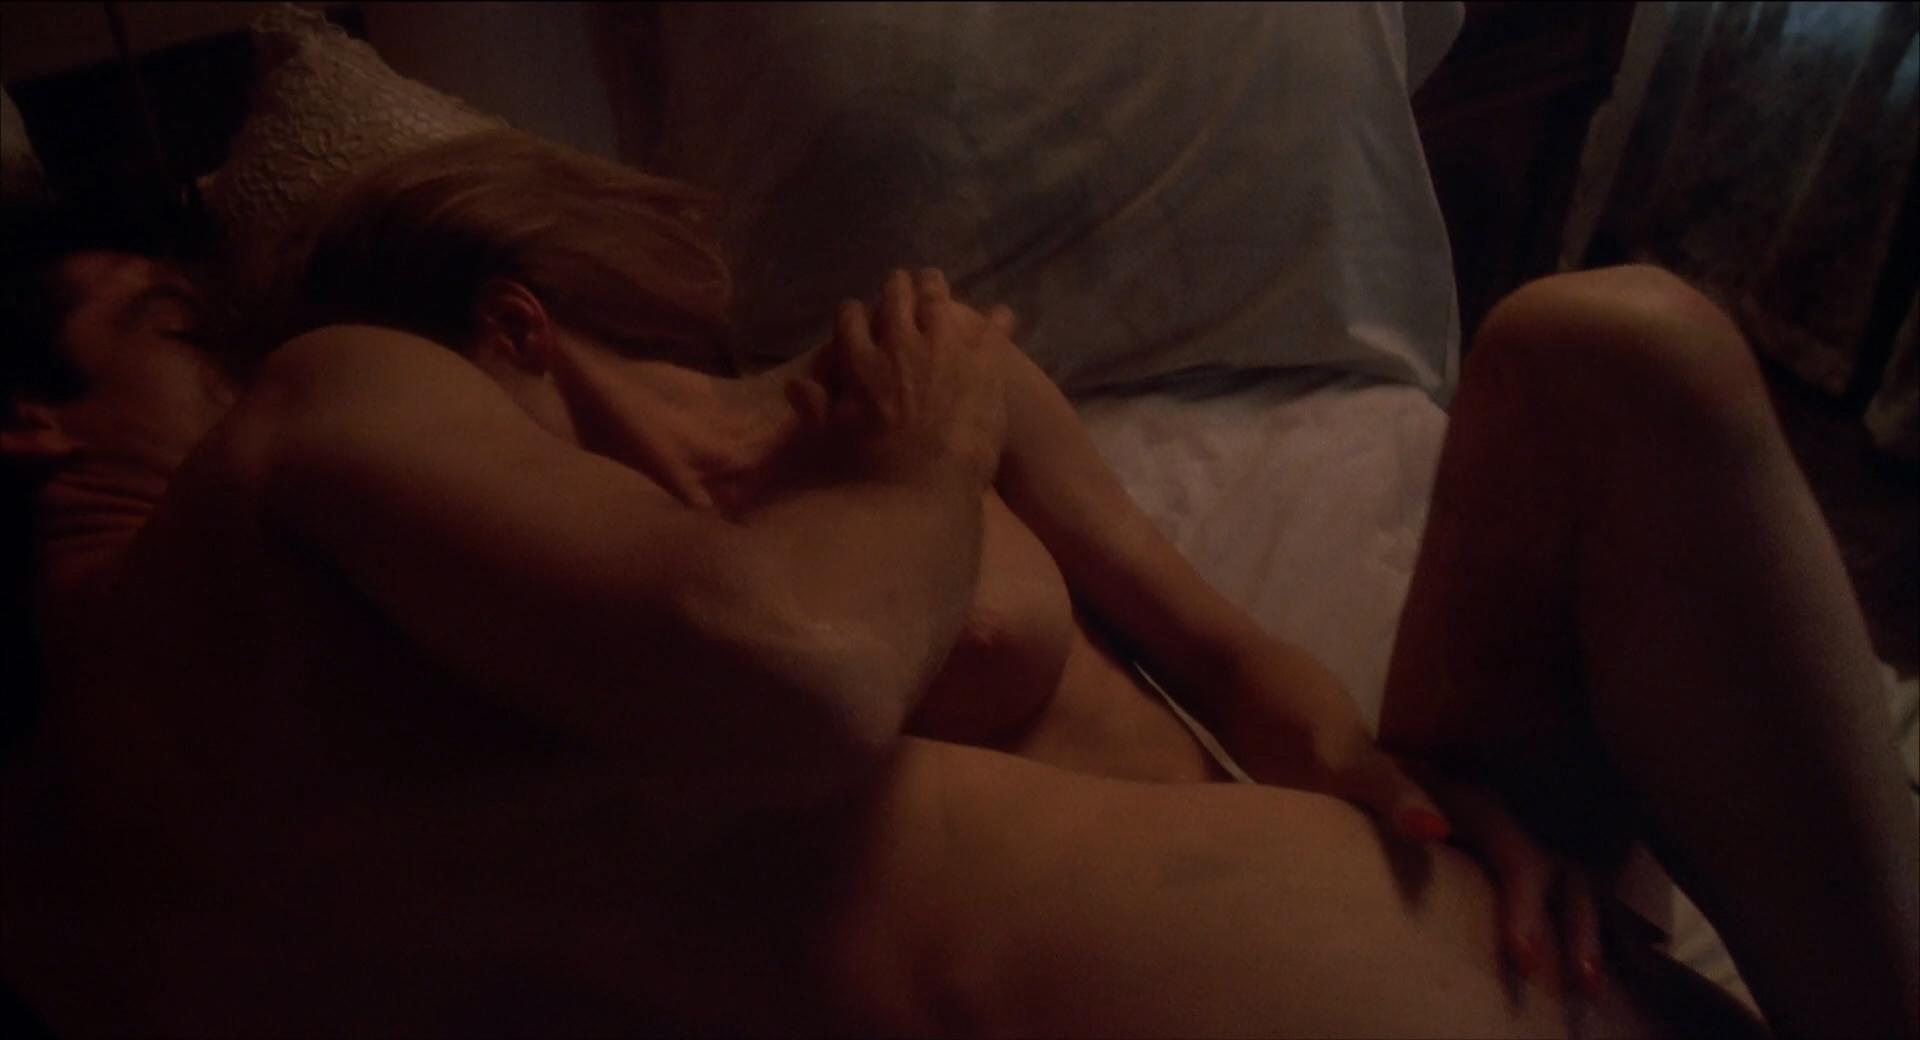 Alba thong sex scene live